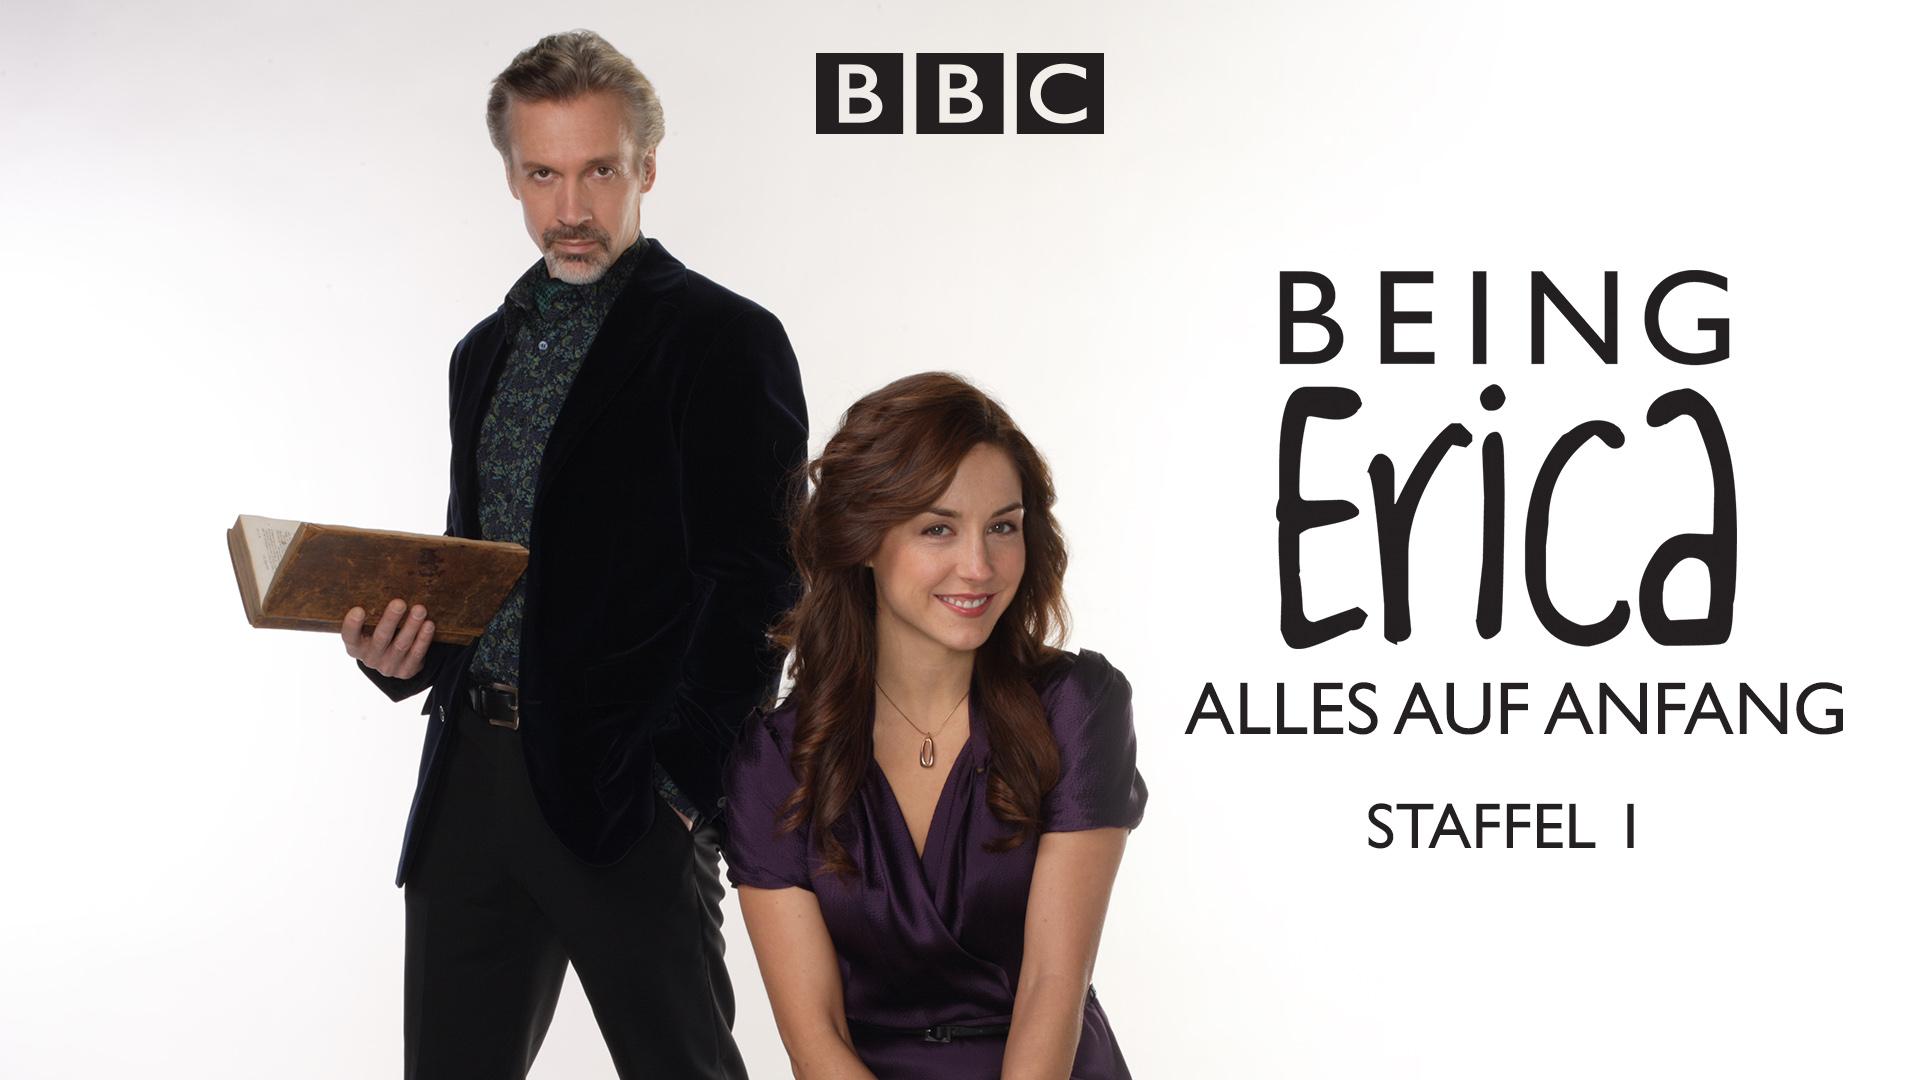 Being Erica: Alles auf Anfang - Staffel 1 [dt./OV]